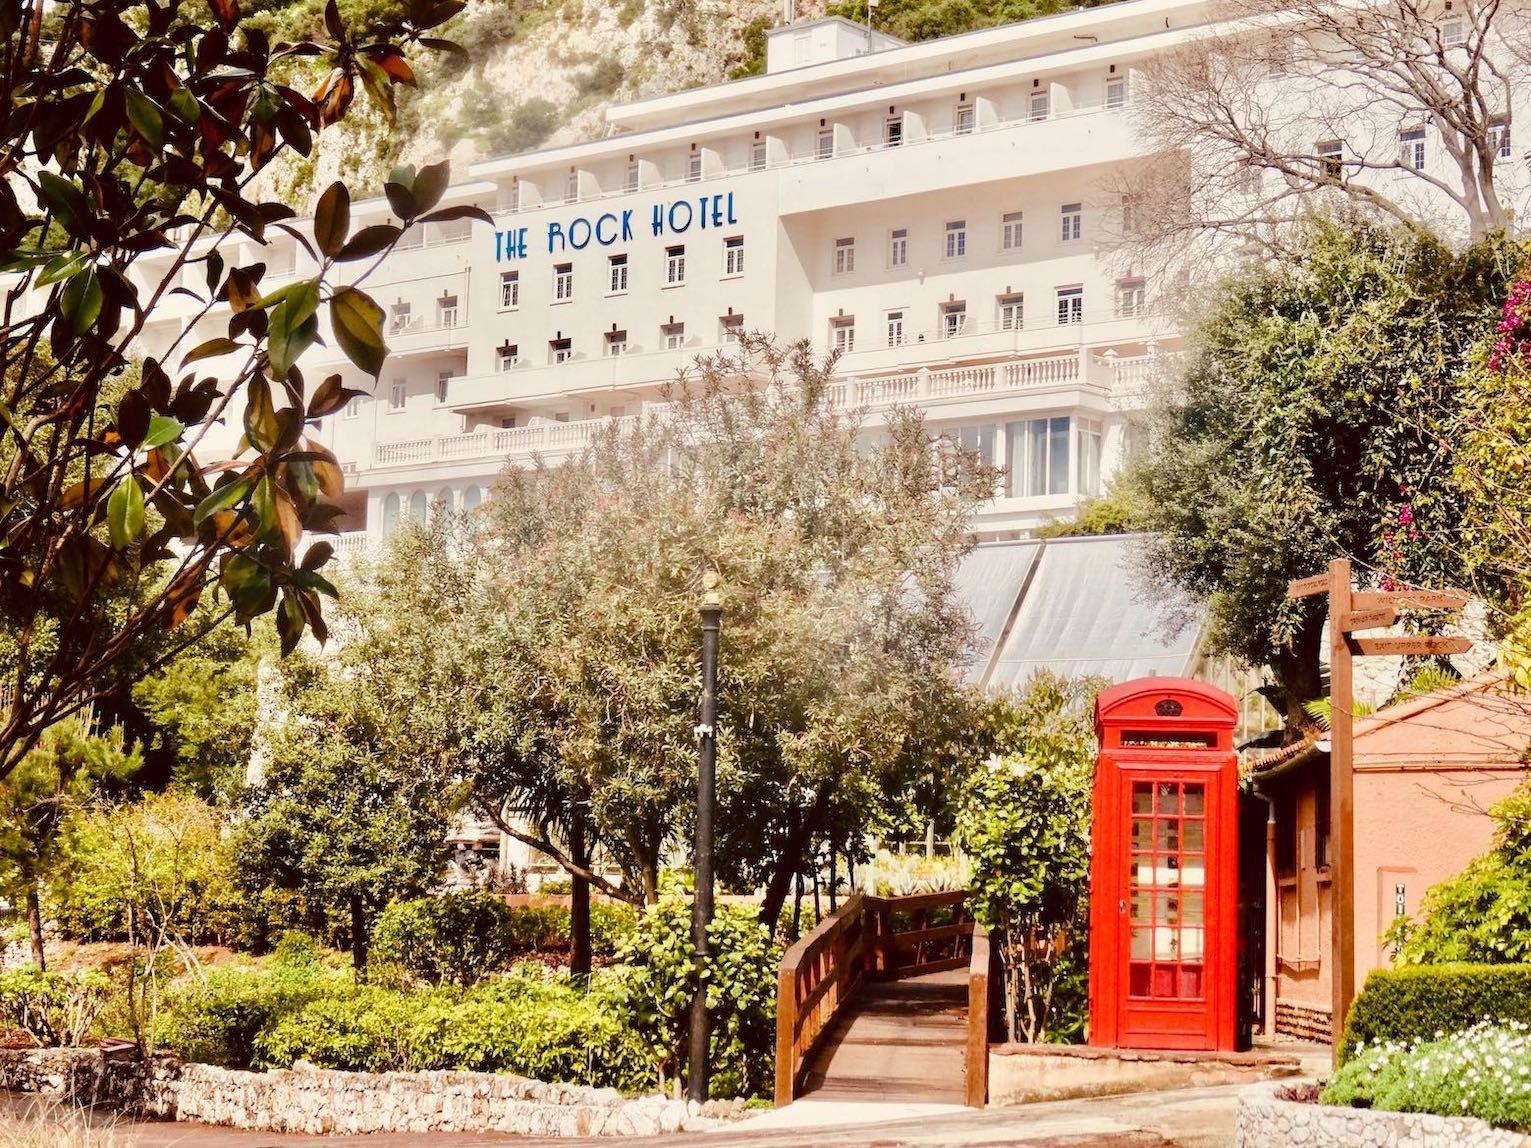 The Rock Hotel in Gibraltar.